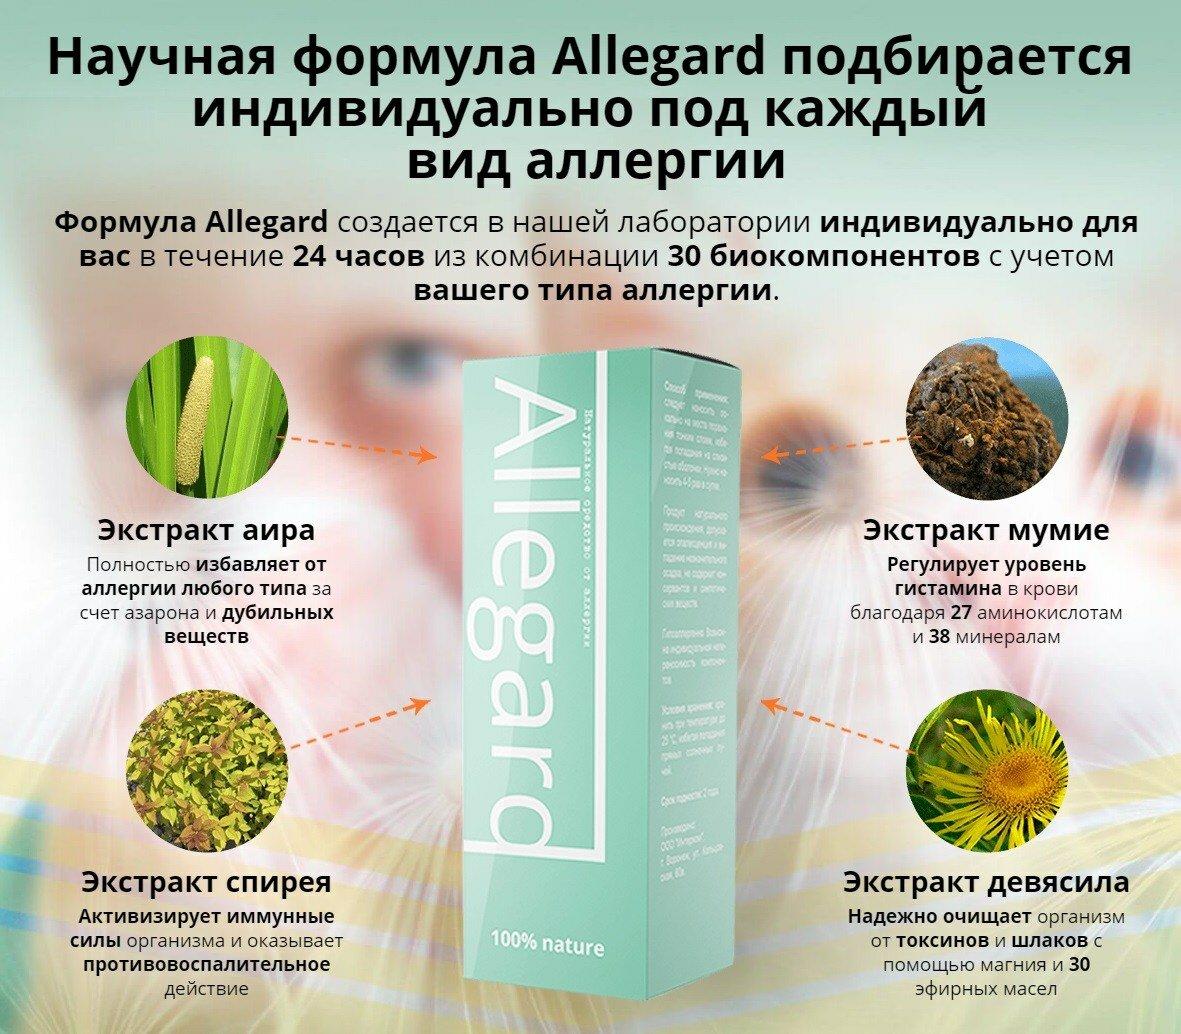 Allegard от аллергии в Черкассах